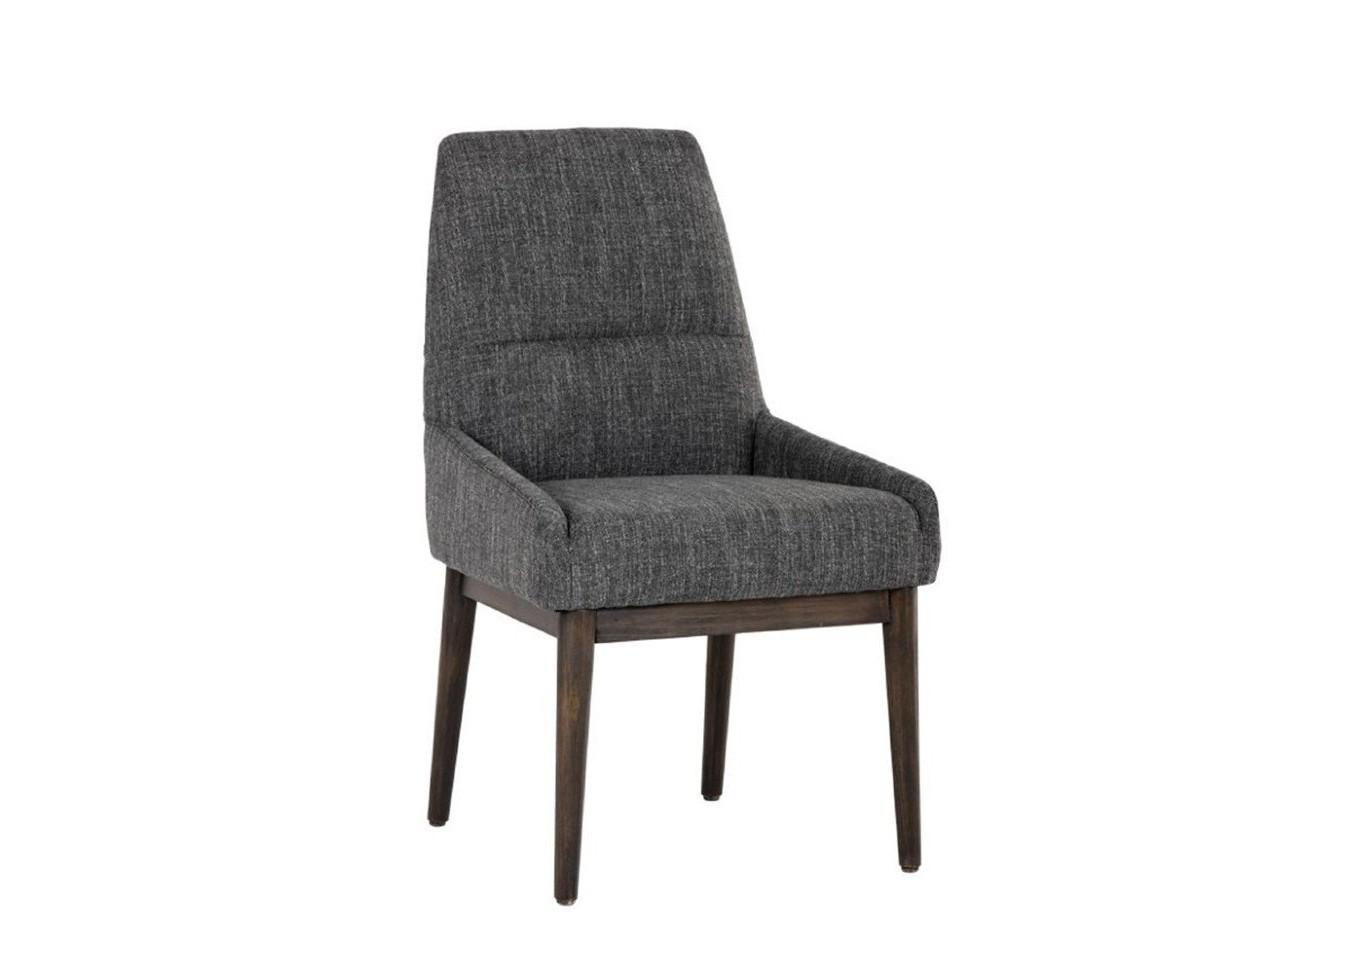 Кухонный стул Icon Designe 15435597 от thefurnish